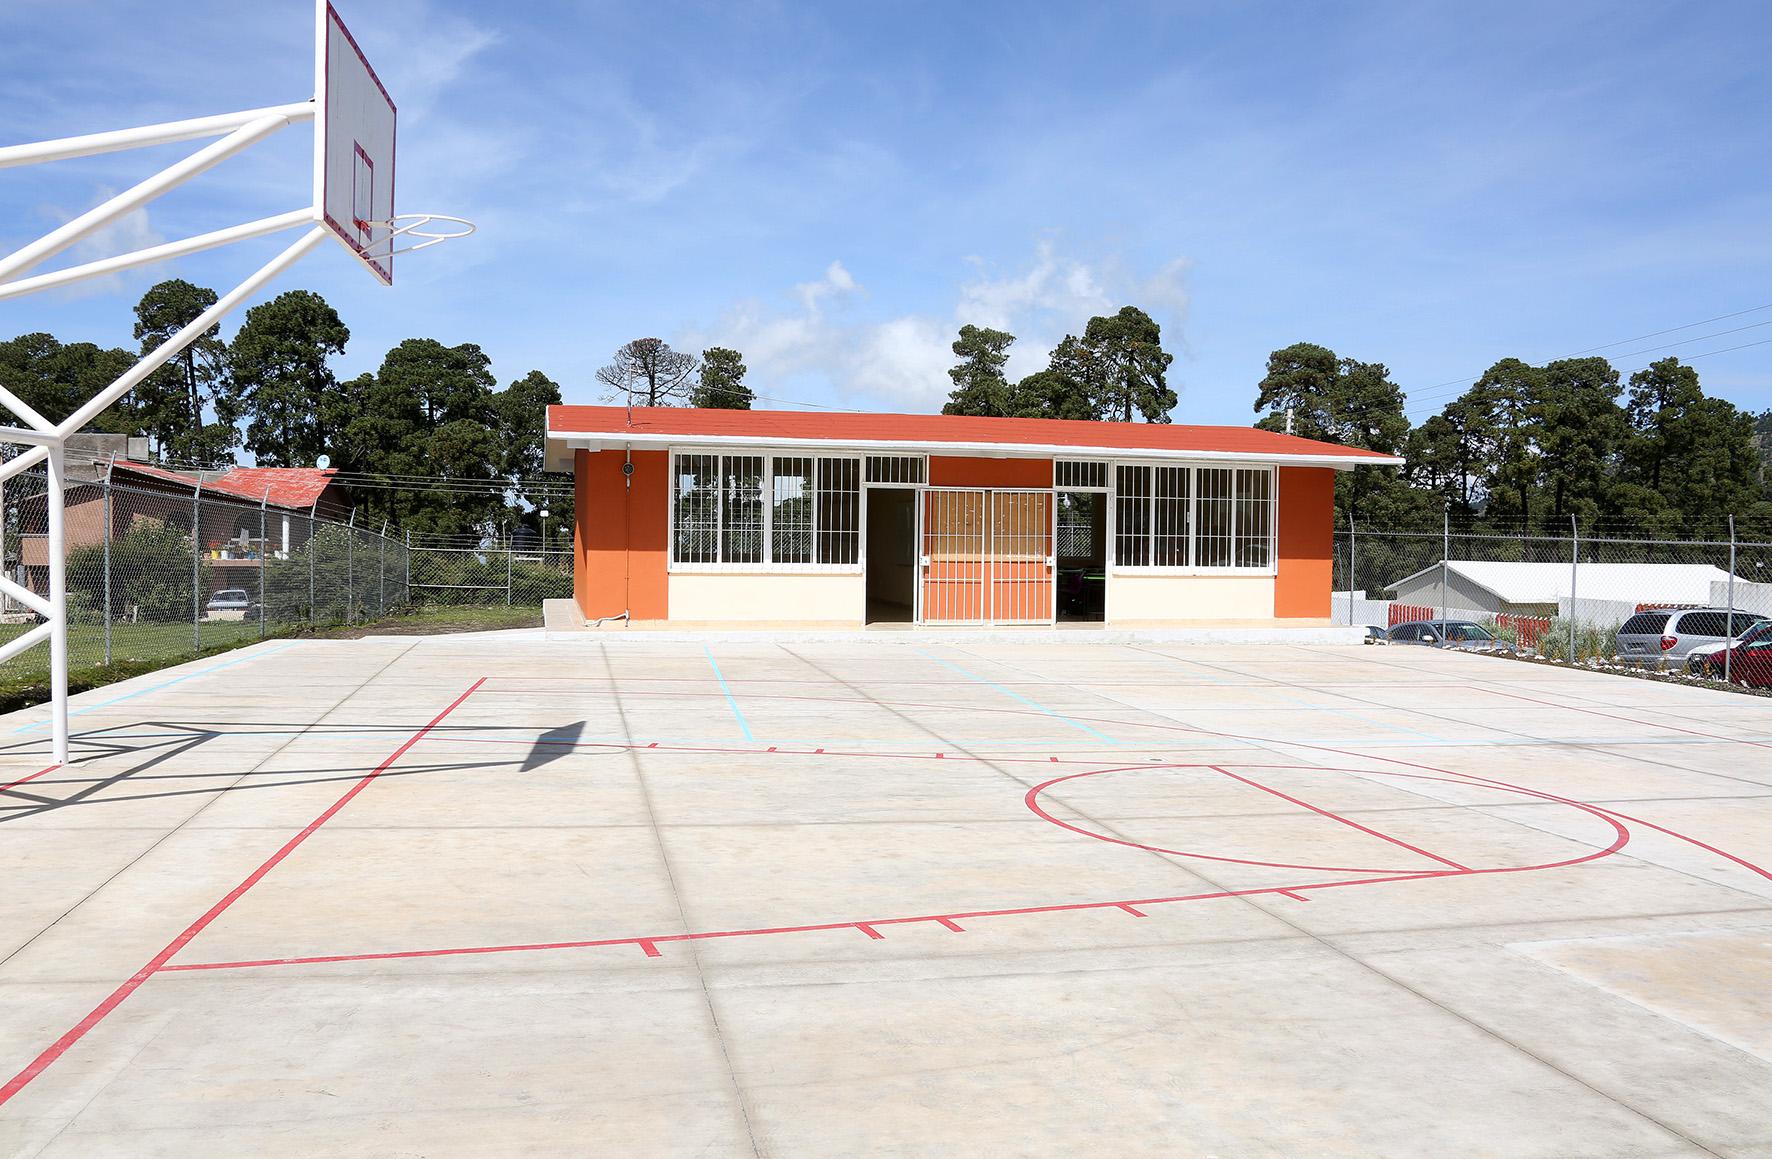 Entrega GEM infraestructura y equipamiento a Telebachillerato de Zinacantepec